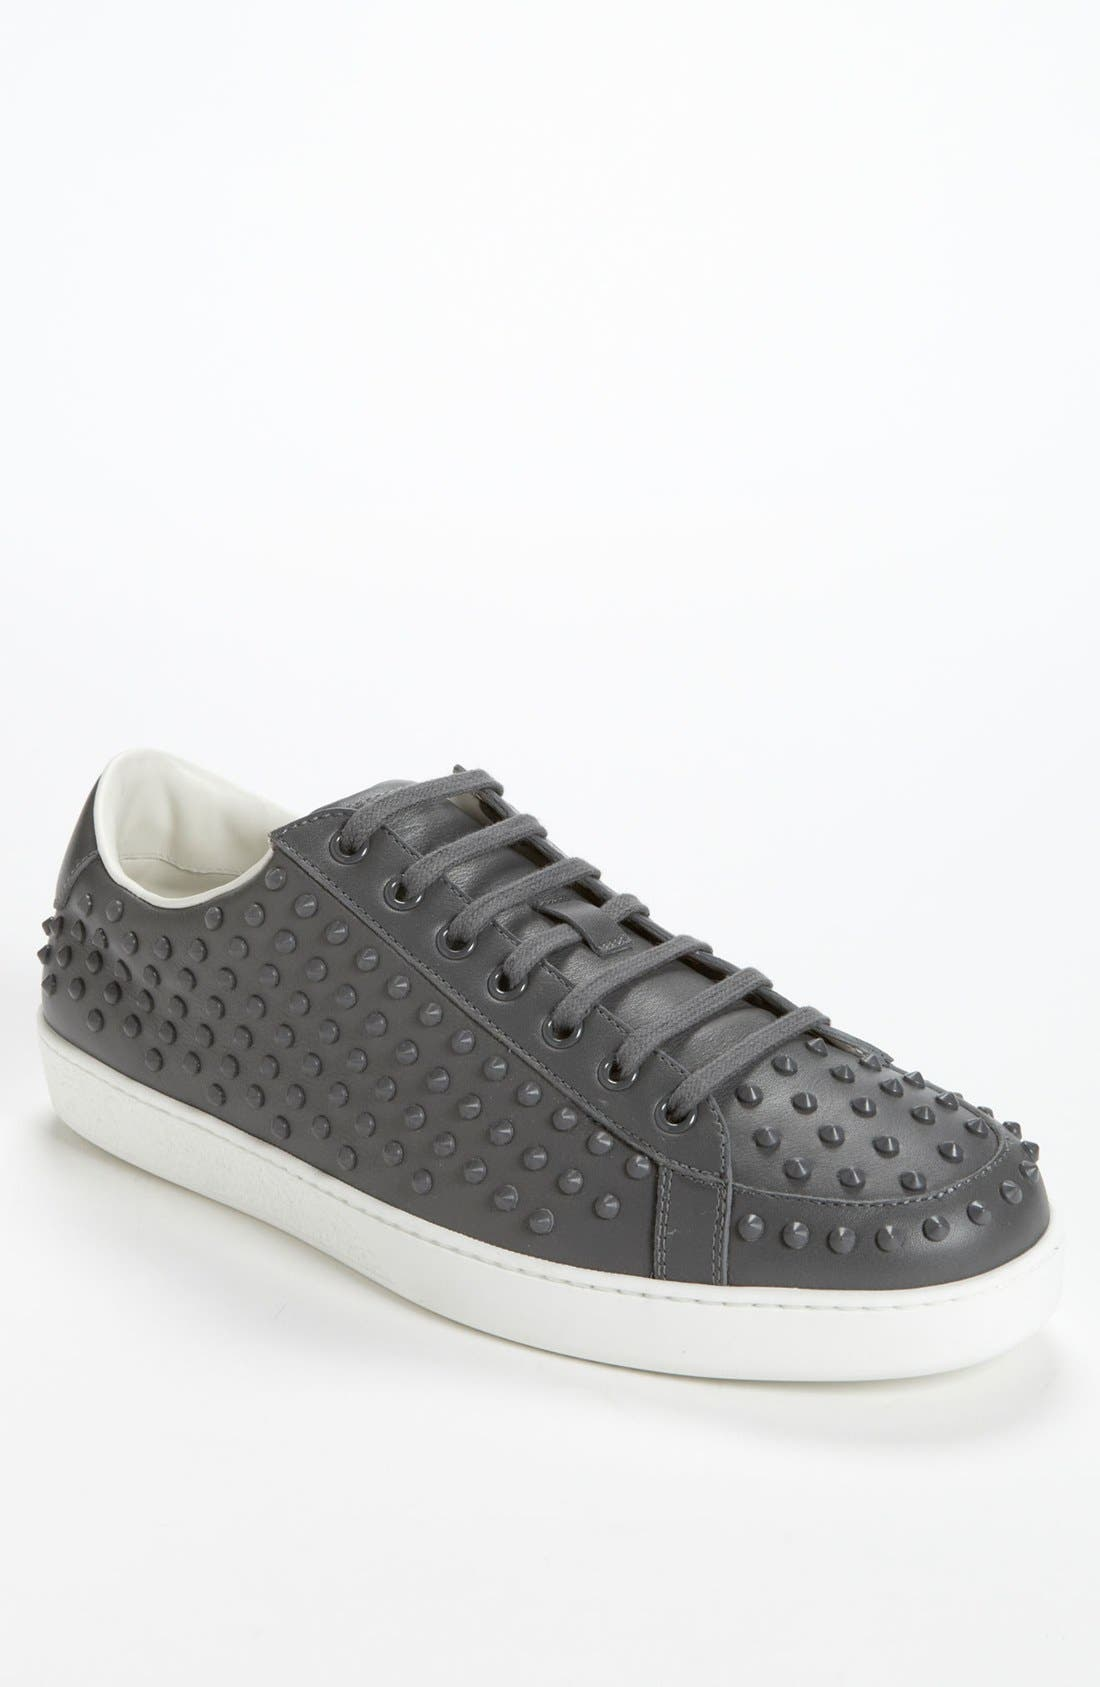 Main Image - Gucci 'Brooklyn' Sneaker